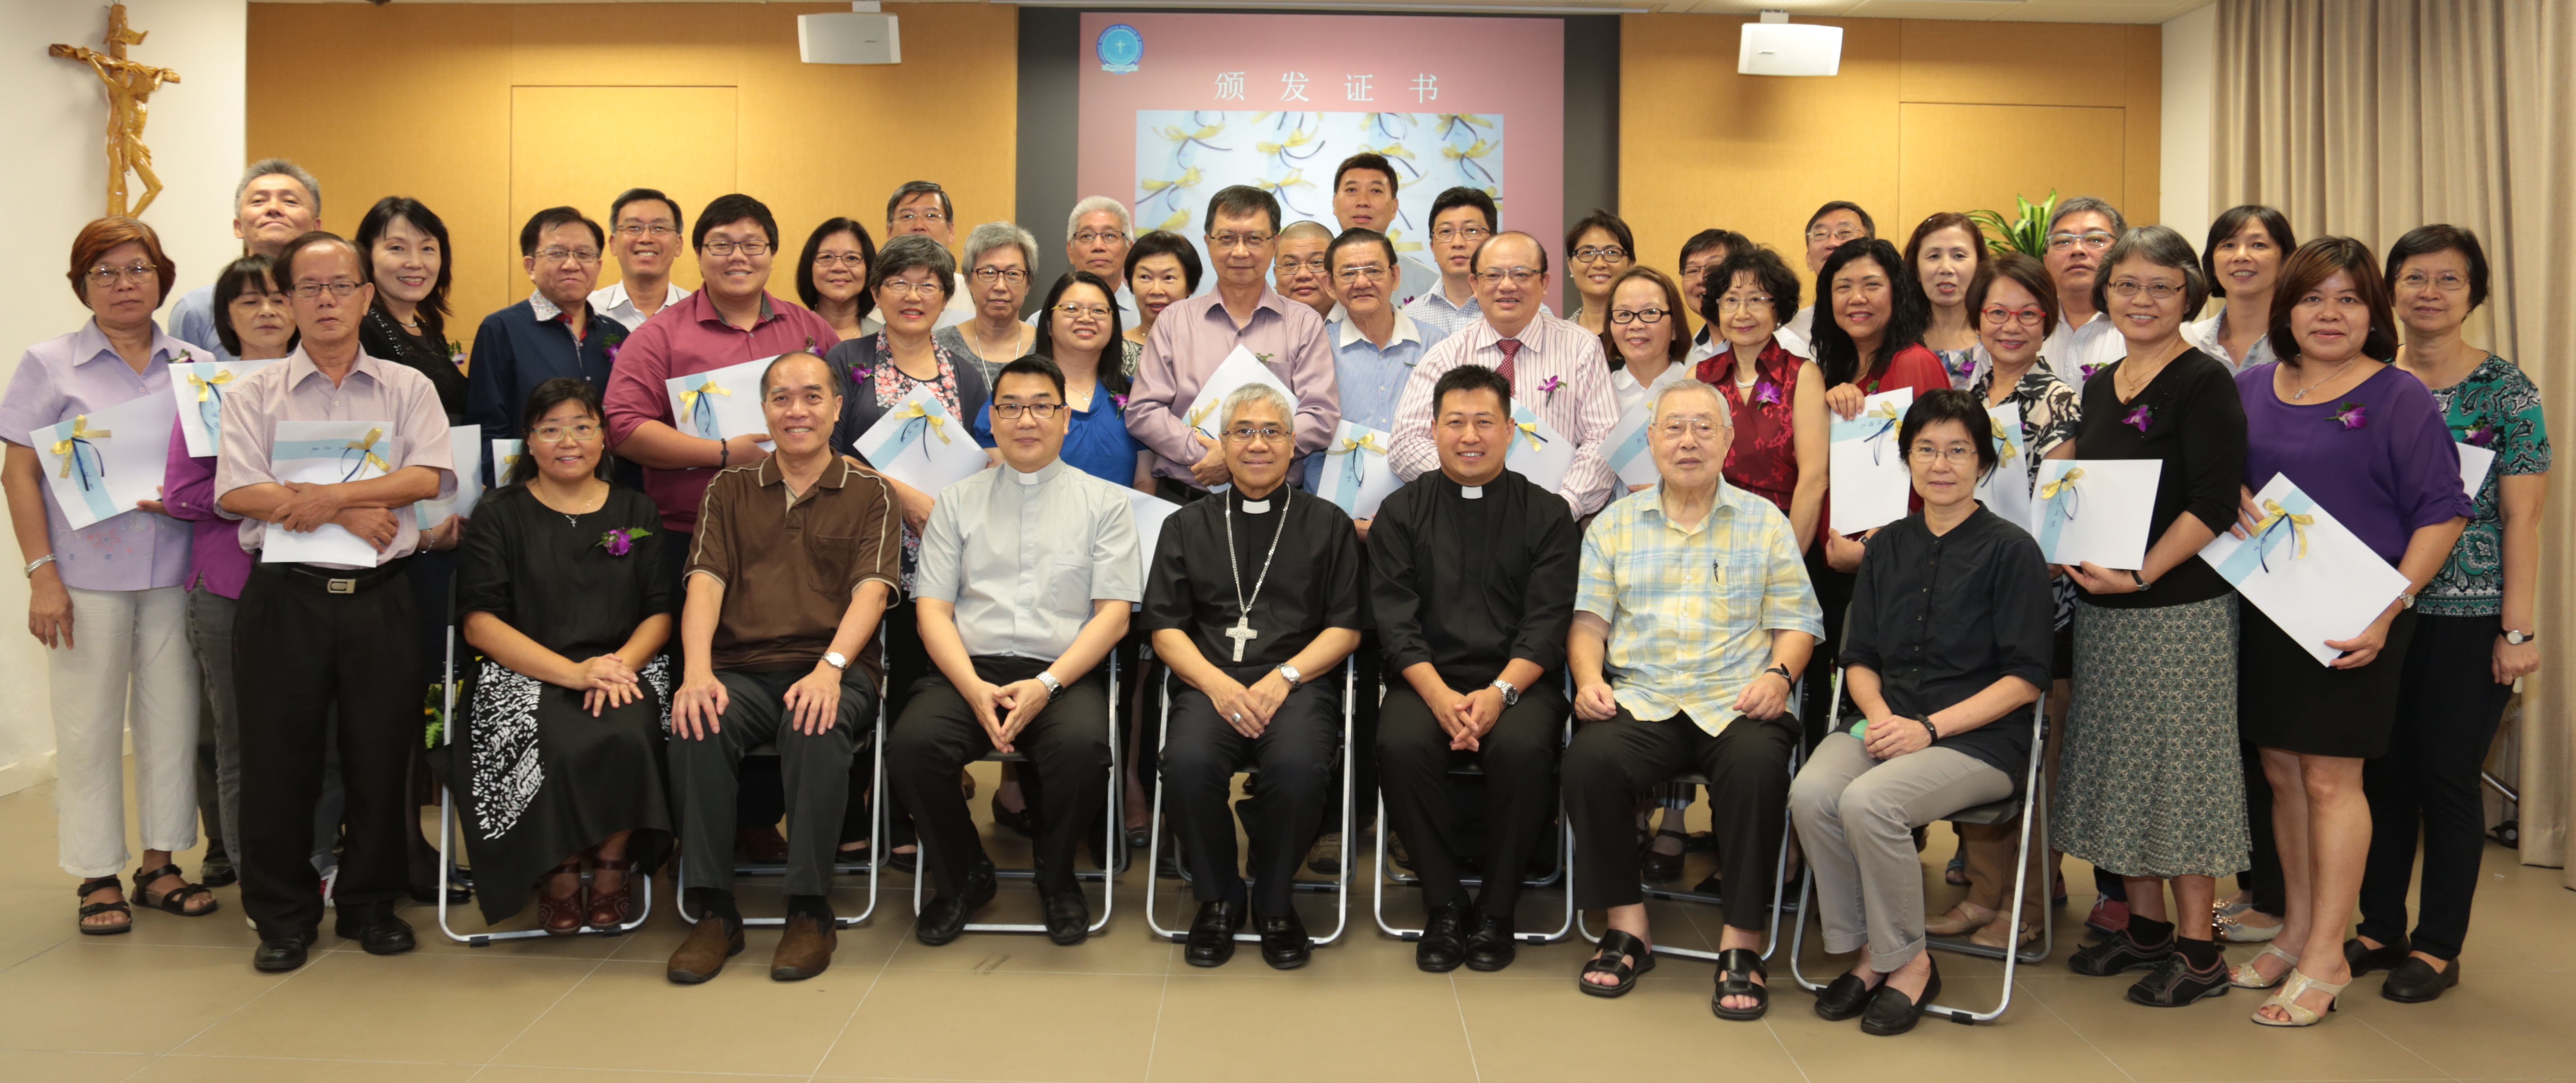 CTIS Cert Grads 2015 (Mandarin)